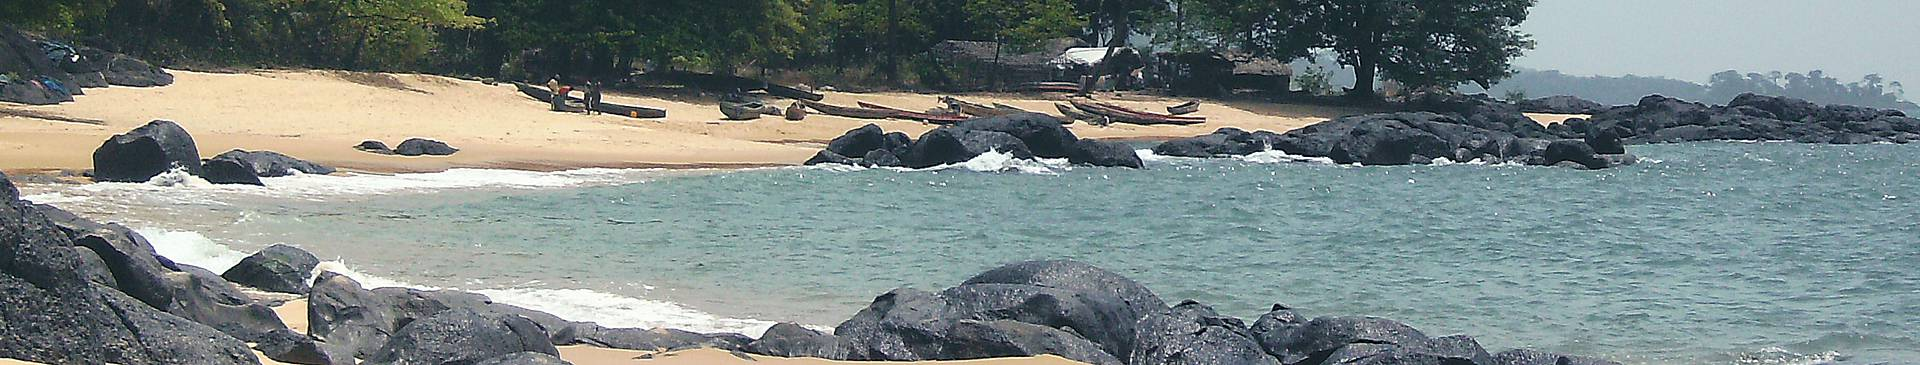 Voyage plage au Cameroun